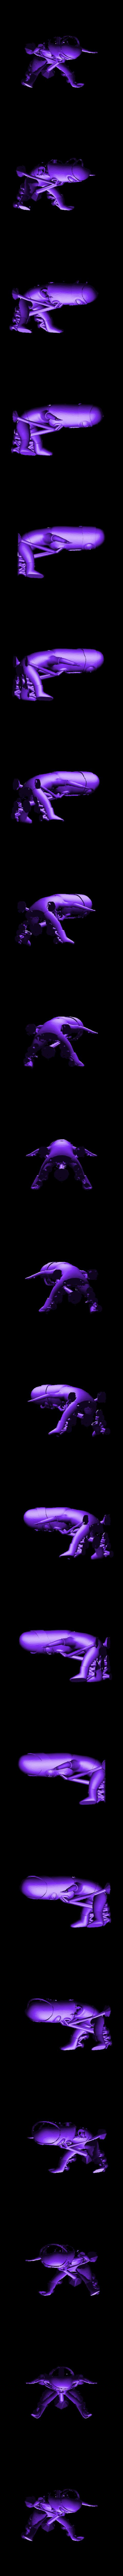 Noob Noob Body WIth Supports.stl Download free STL file Noob Noob // Vindicators 3: The Return of Worldender • 3D printer model, derailed